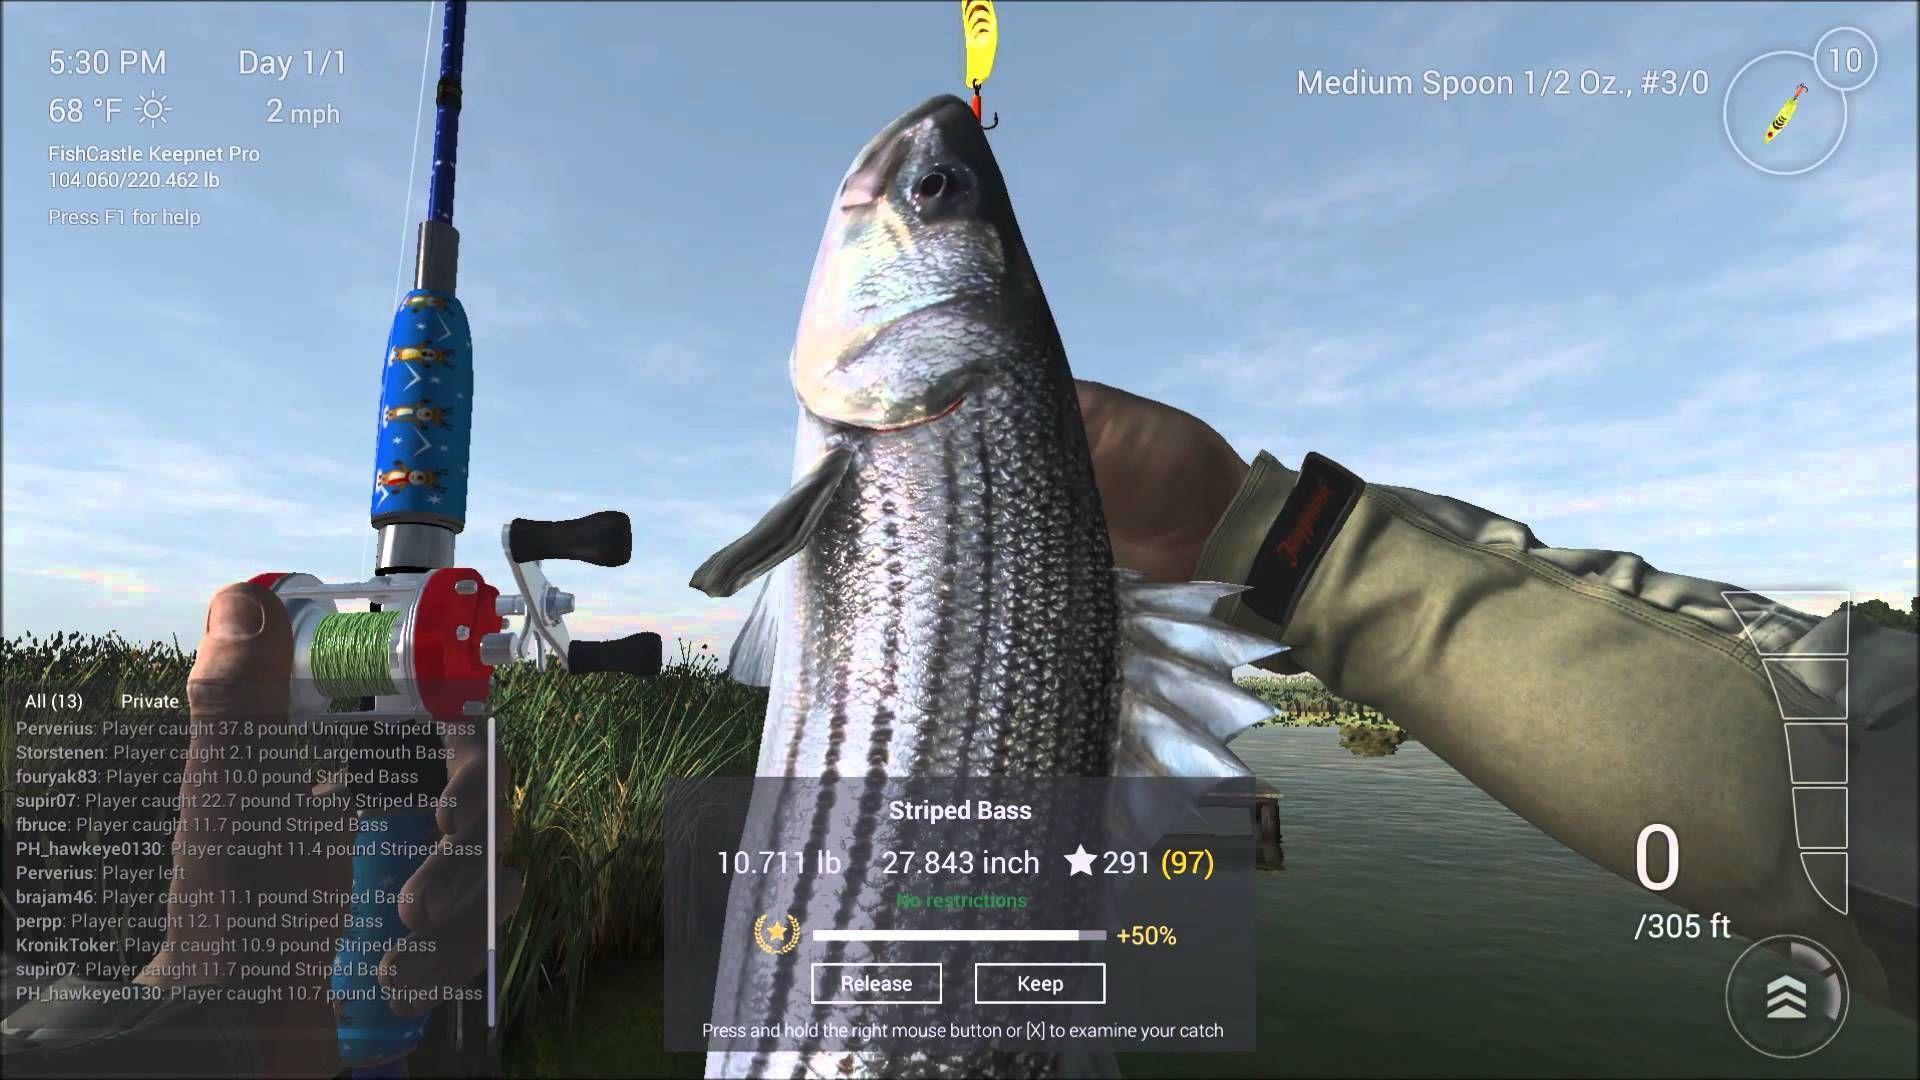 fishing ps4 tips and tricks https//gofishing